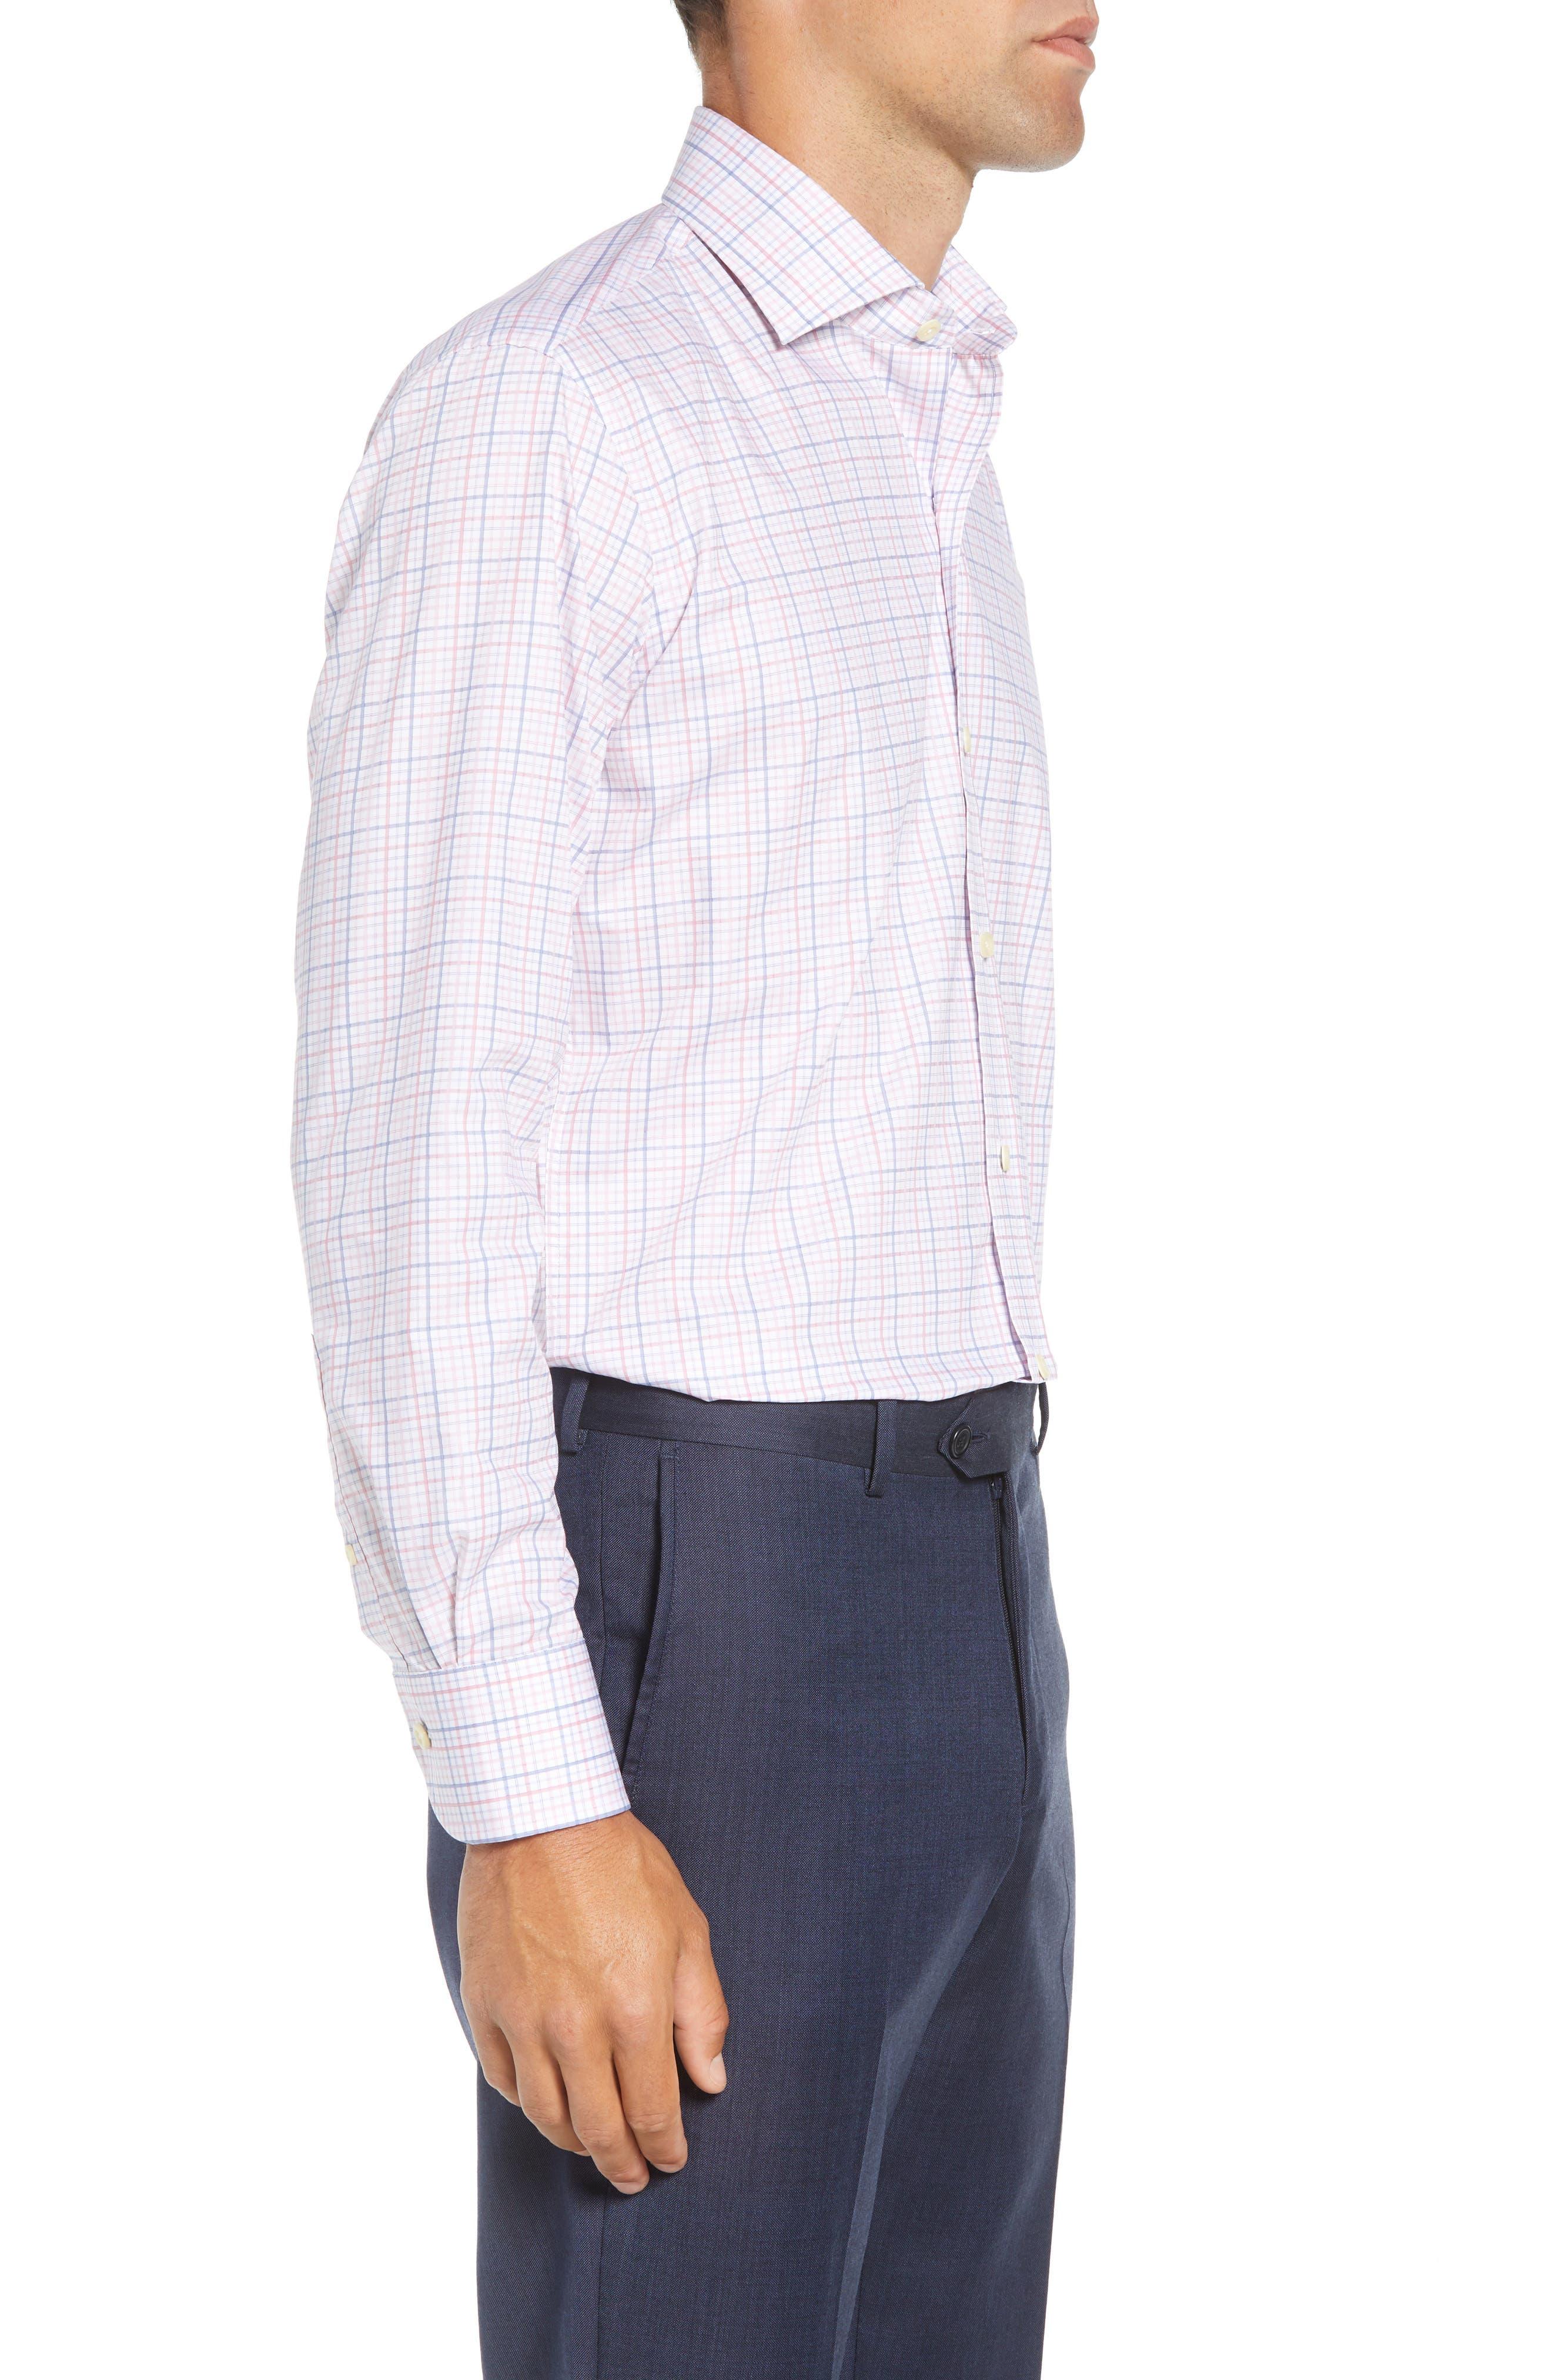 Drazin Trim Fit Check Dress Shirt,                             Alternate thumbnail 4, color,                             PINK